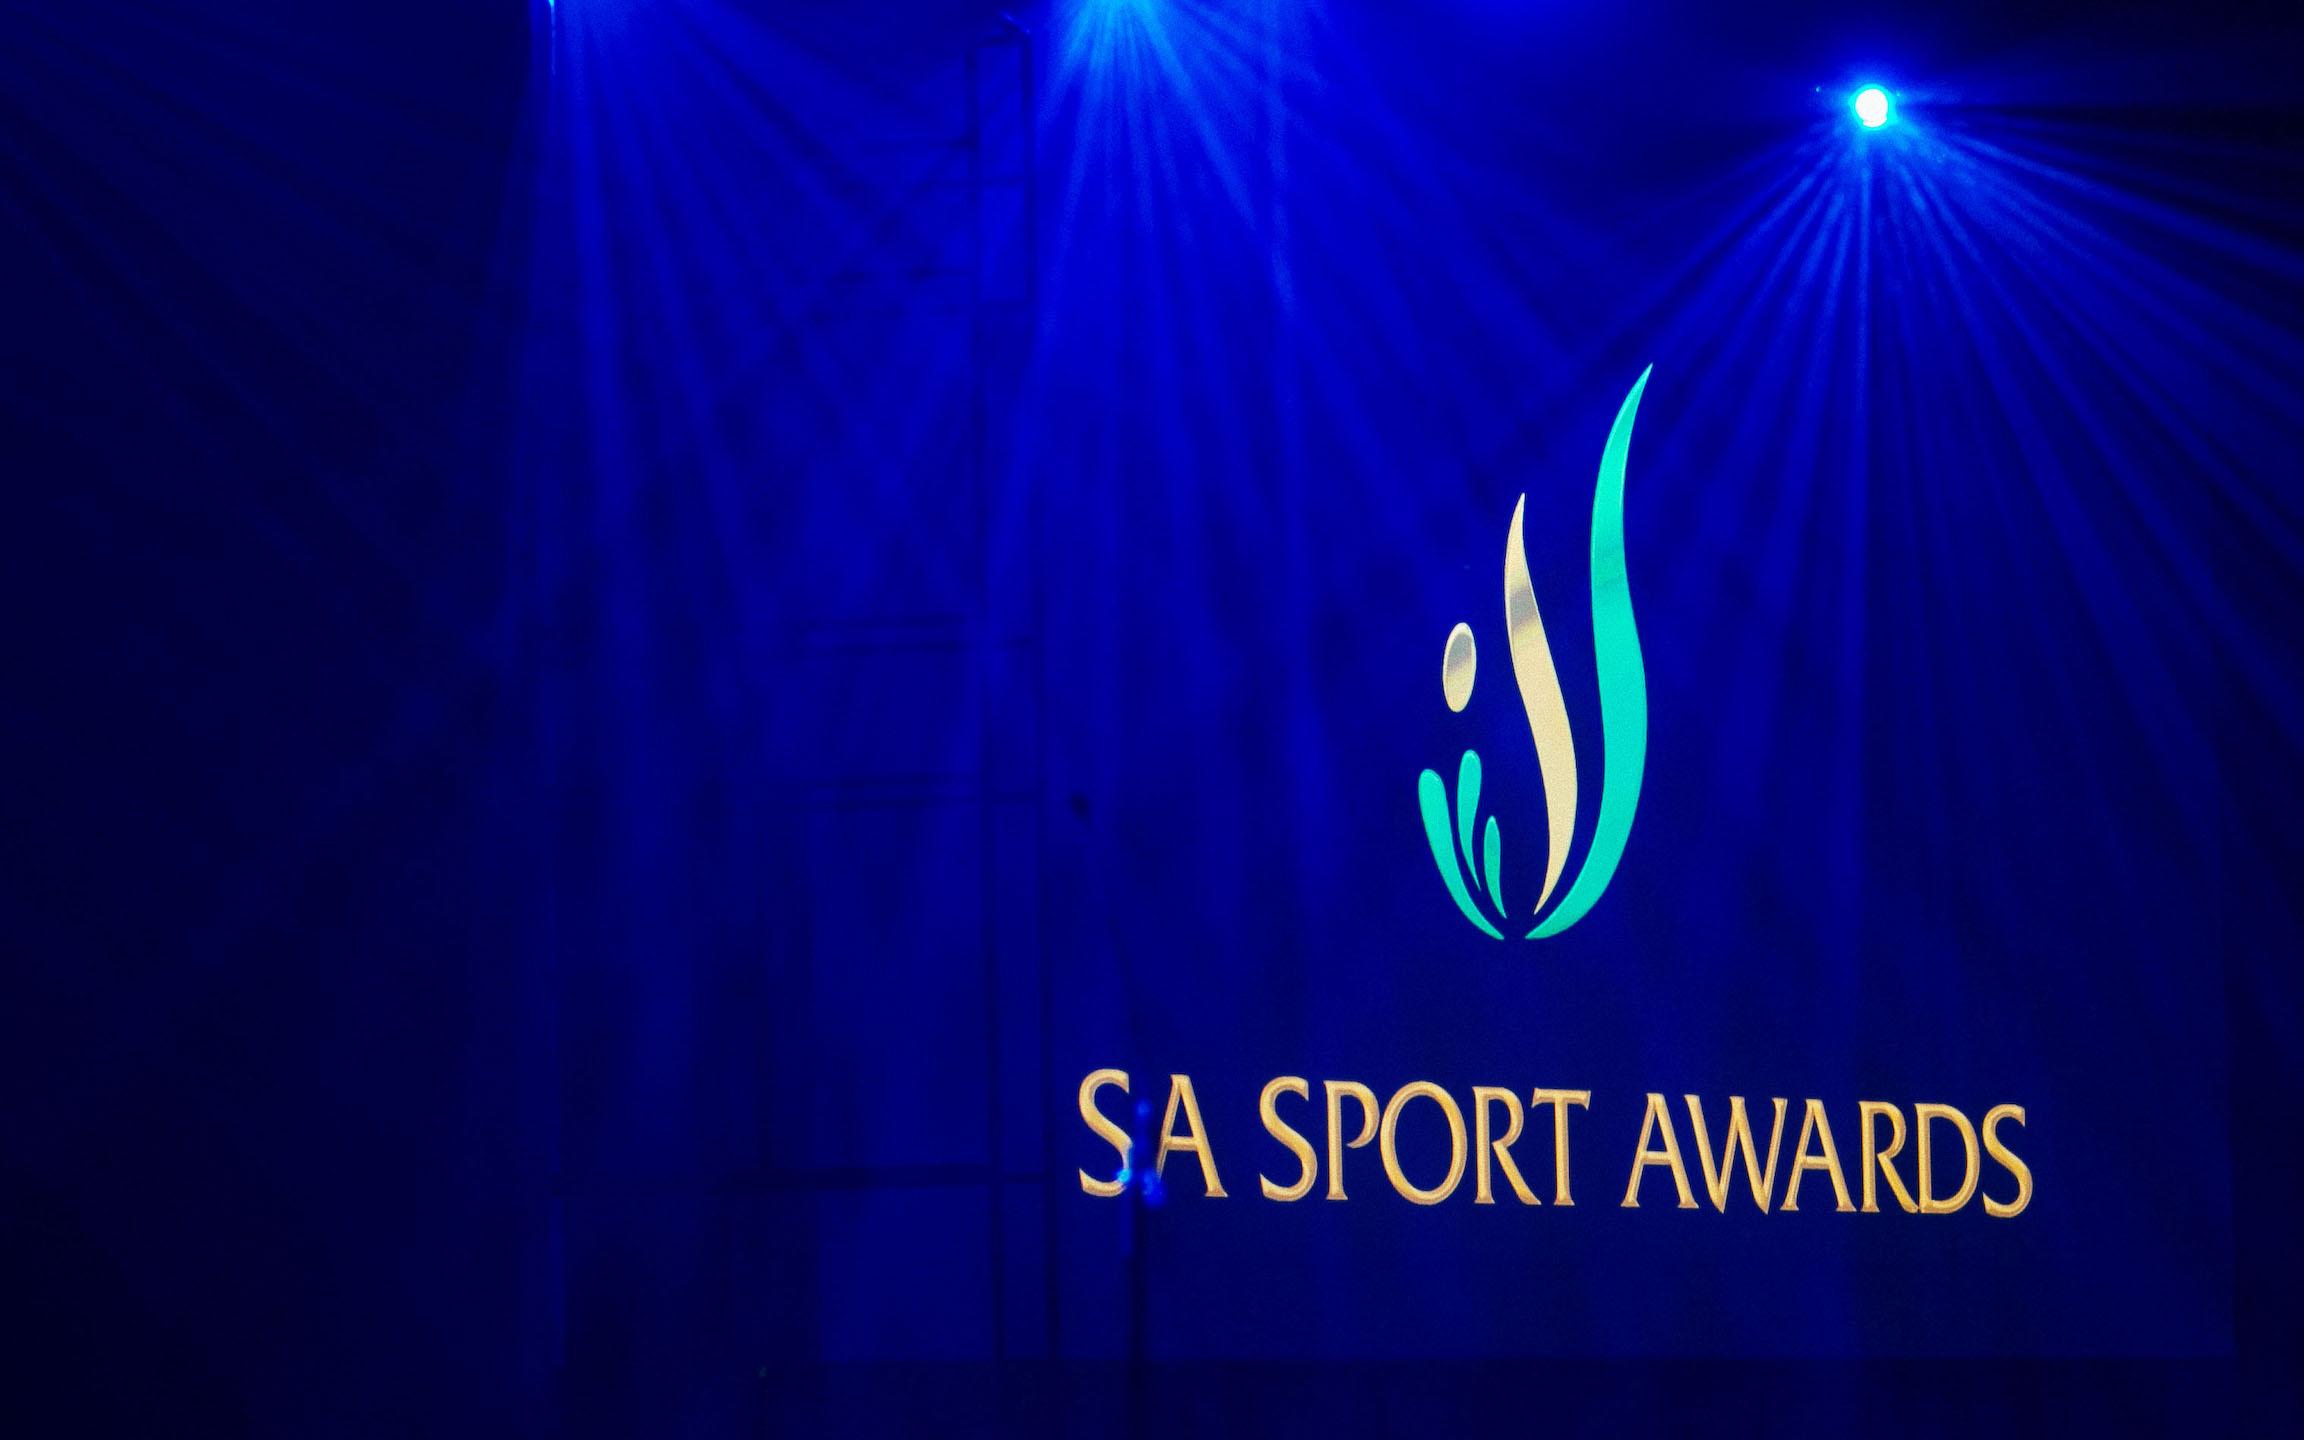 SA Sport Awards